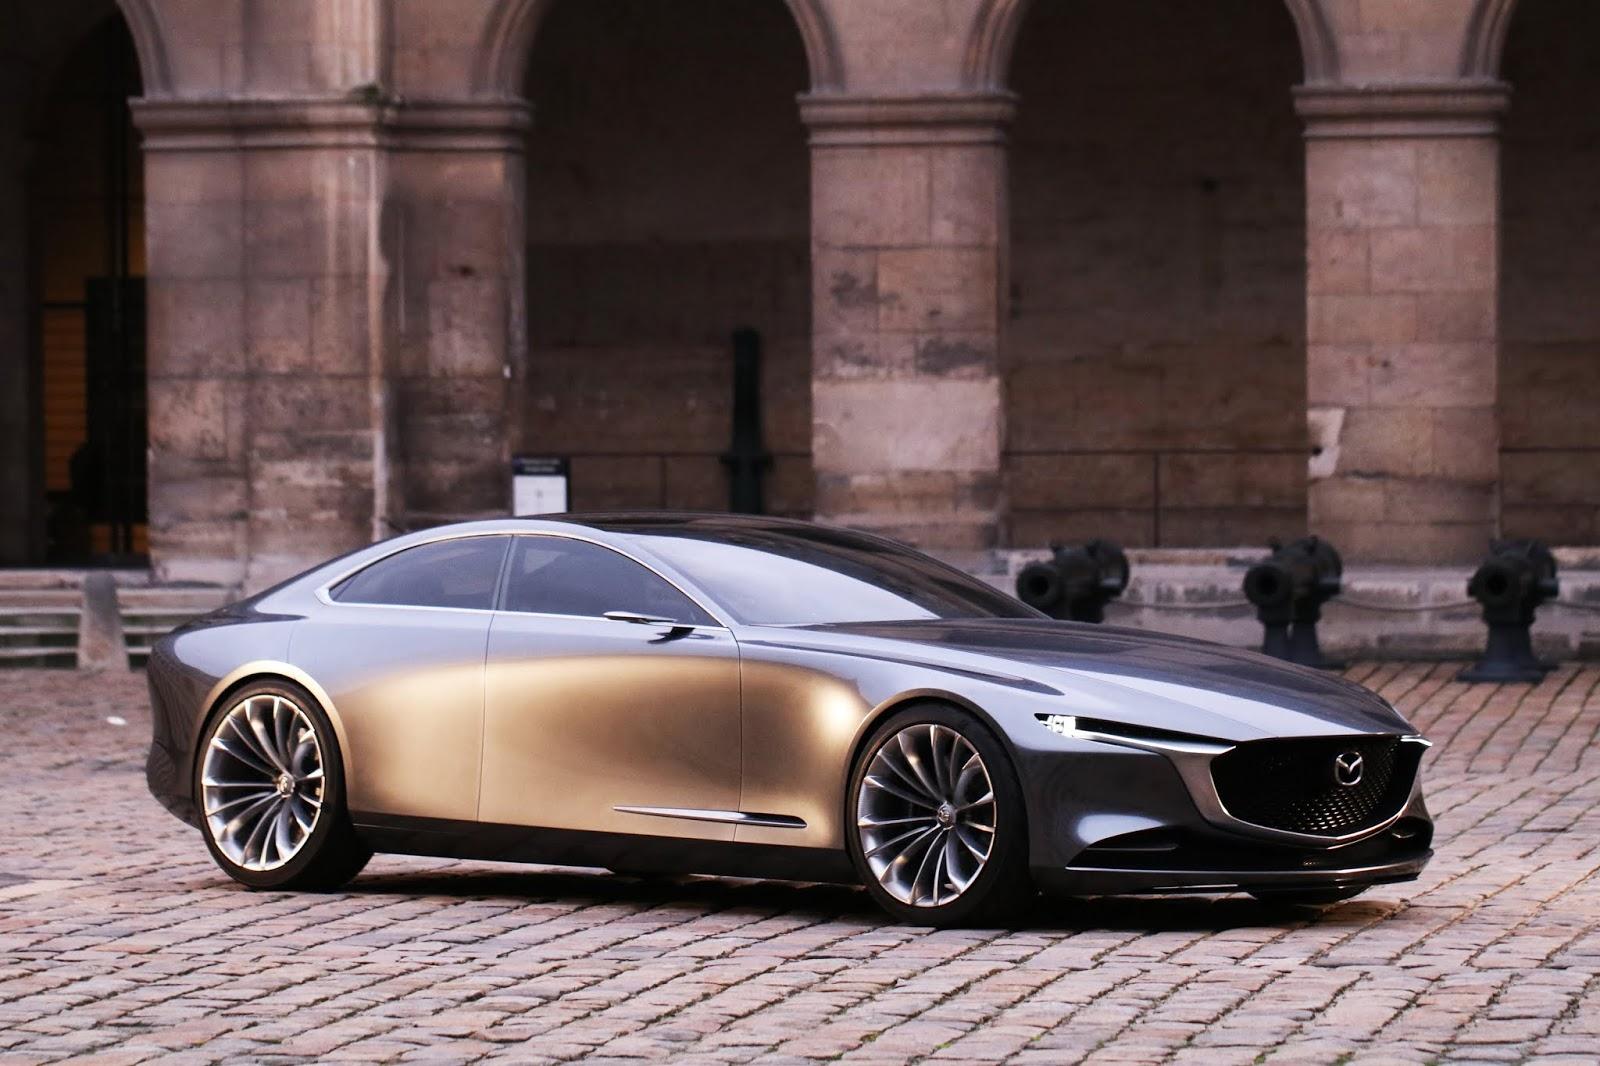 Mazda VISION COUPE most beautiful concept award 2018 7 Mazda RX-9, εσύ είσαι;